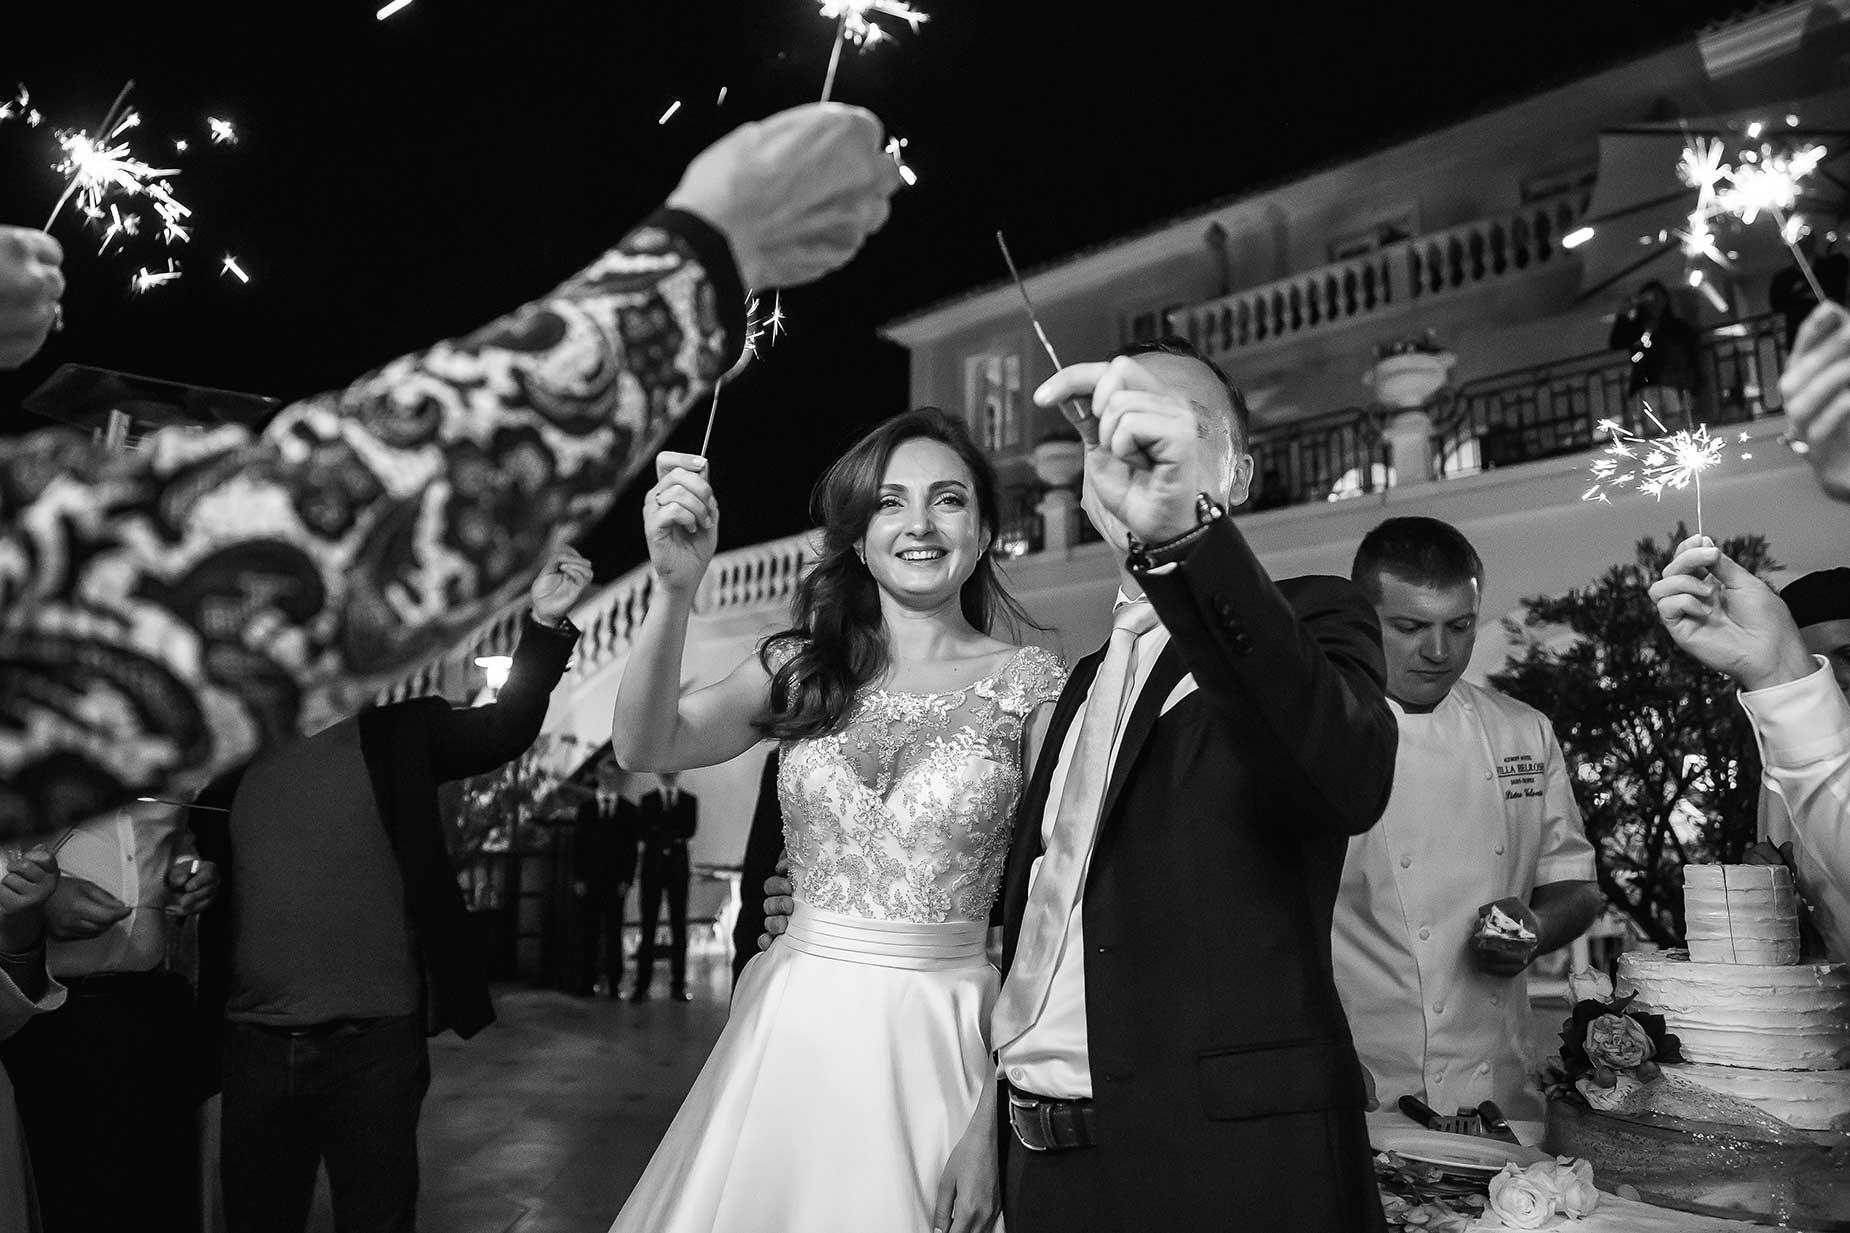 Saint Tropez wedding